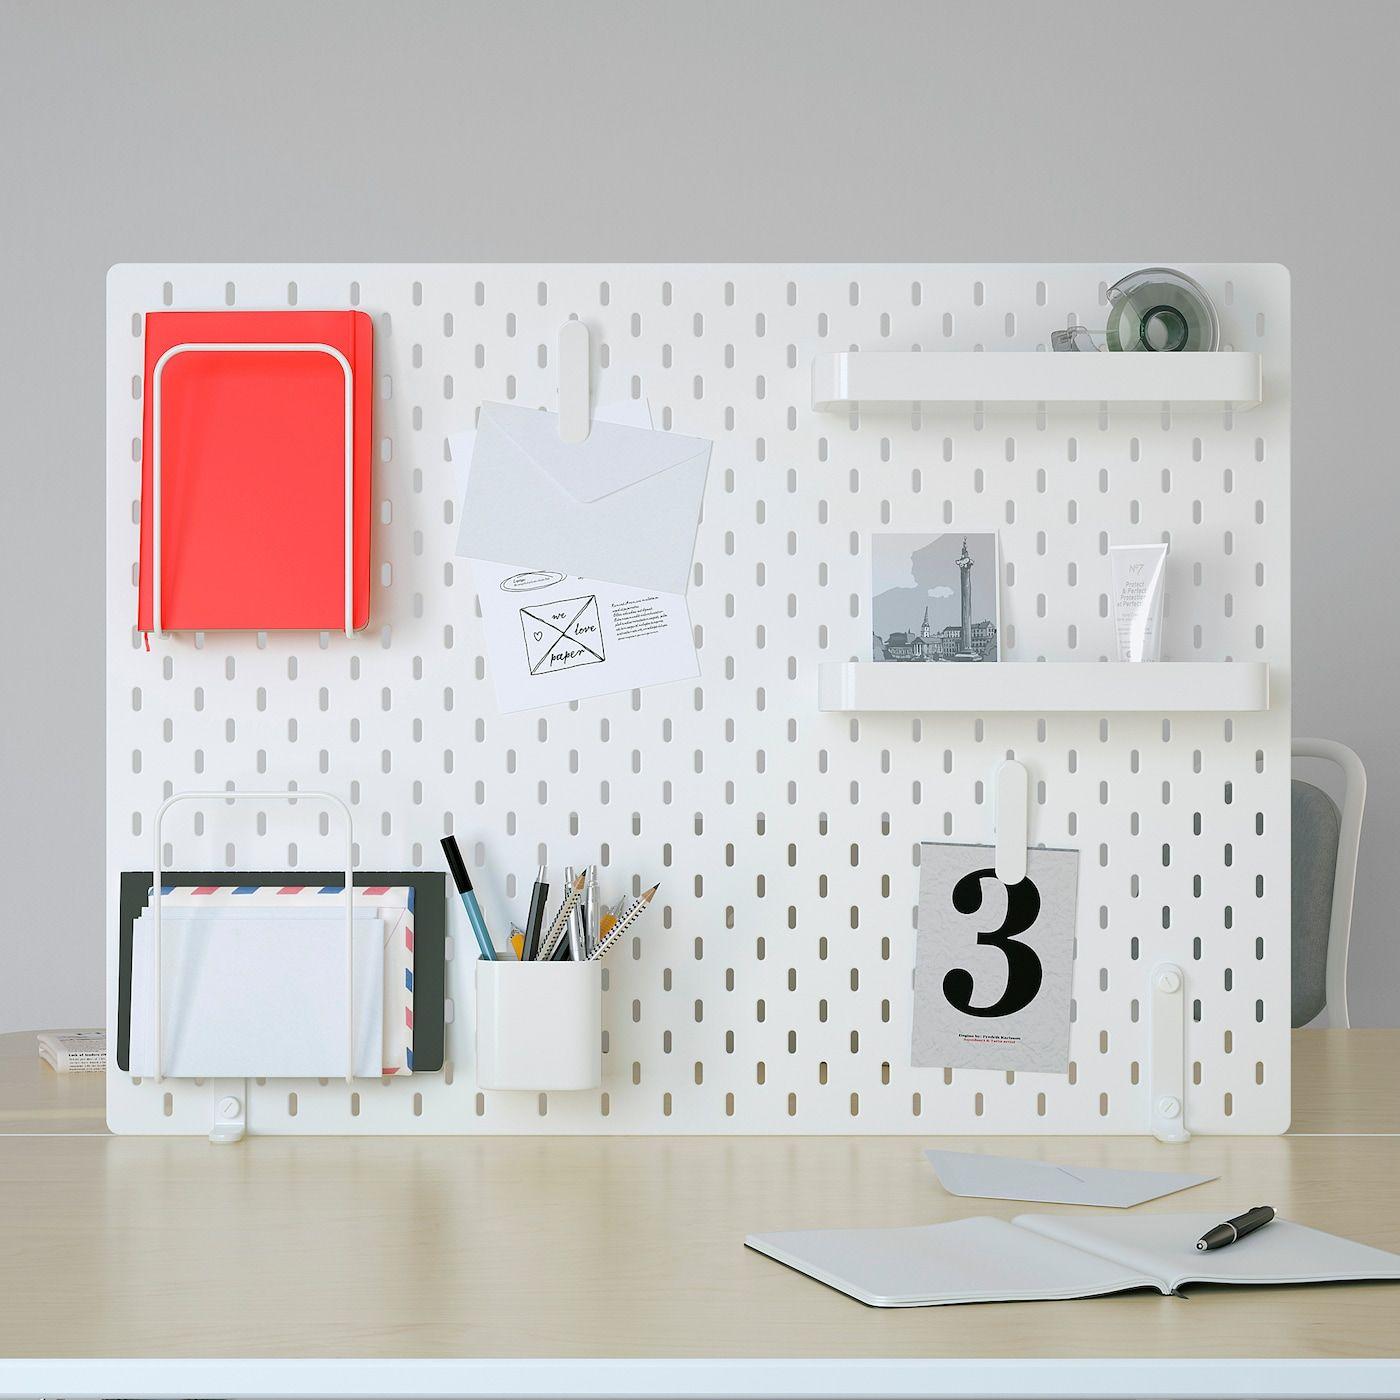 Skadis Lochplatte Kombination Weiss Auf Die Einkaufsliste Ikea Osterreich In 2020 Ikea Pegboard Ikea Peg Board